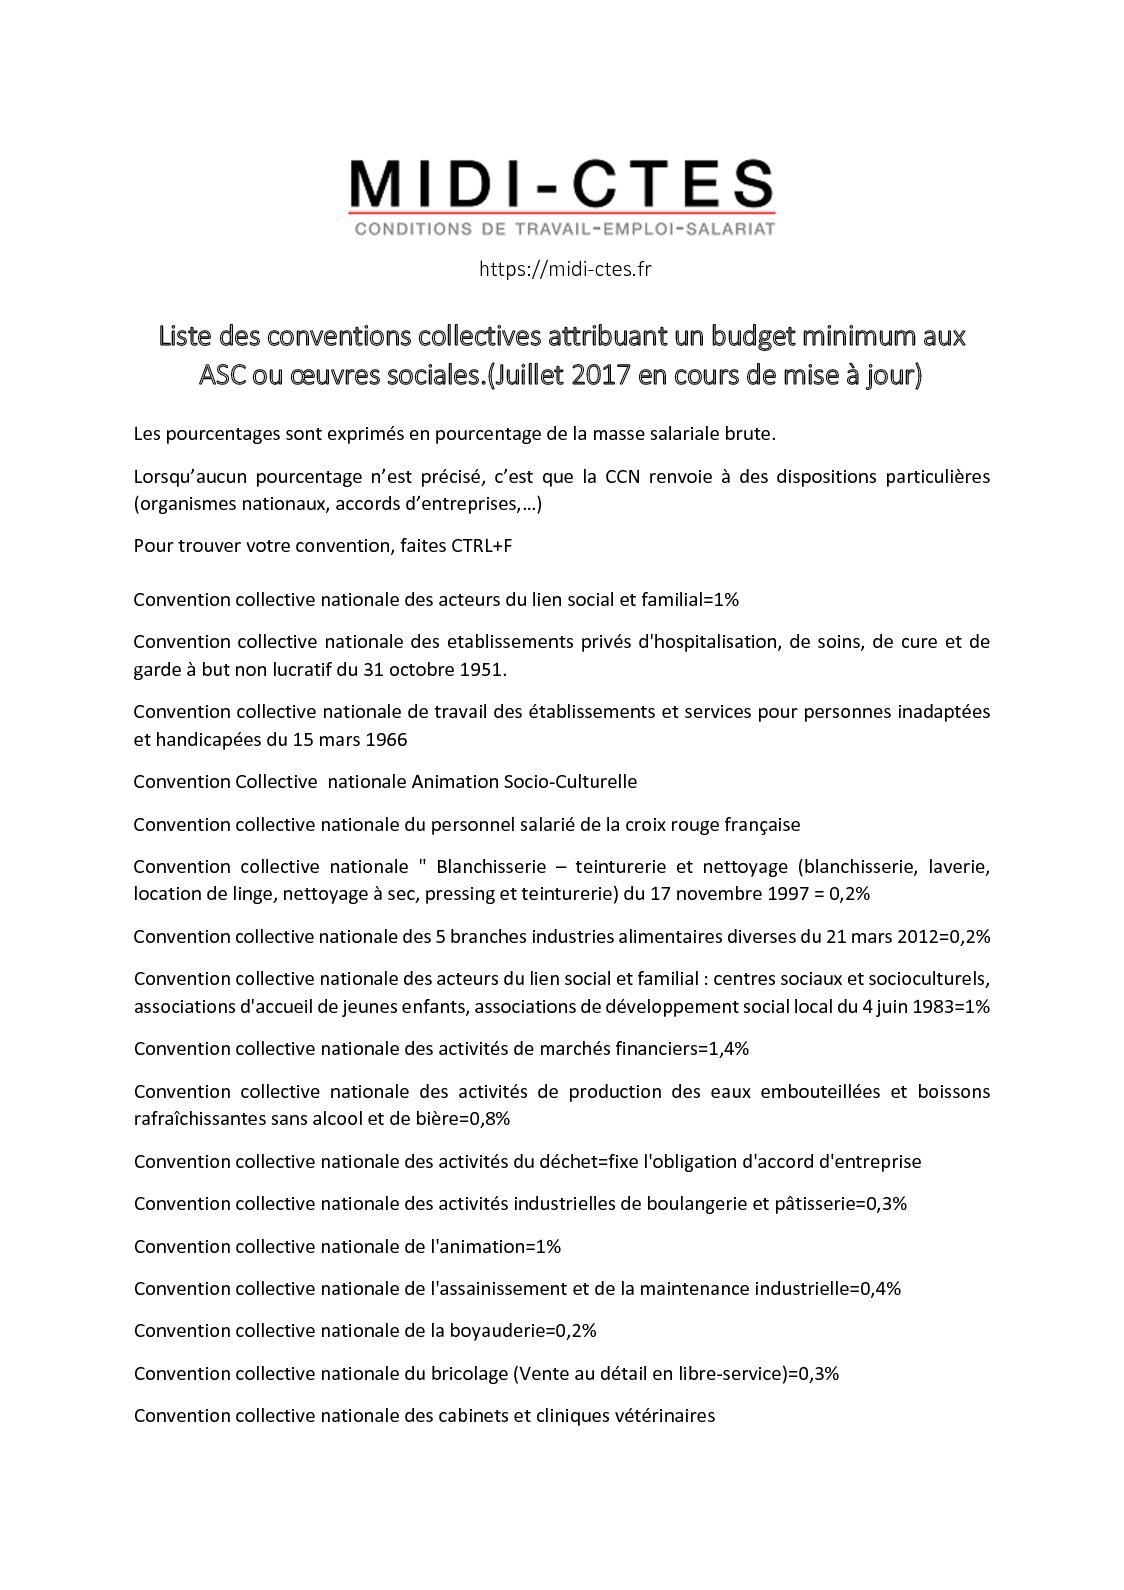 Calameo Conventions Collectives Avec Budget Asc